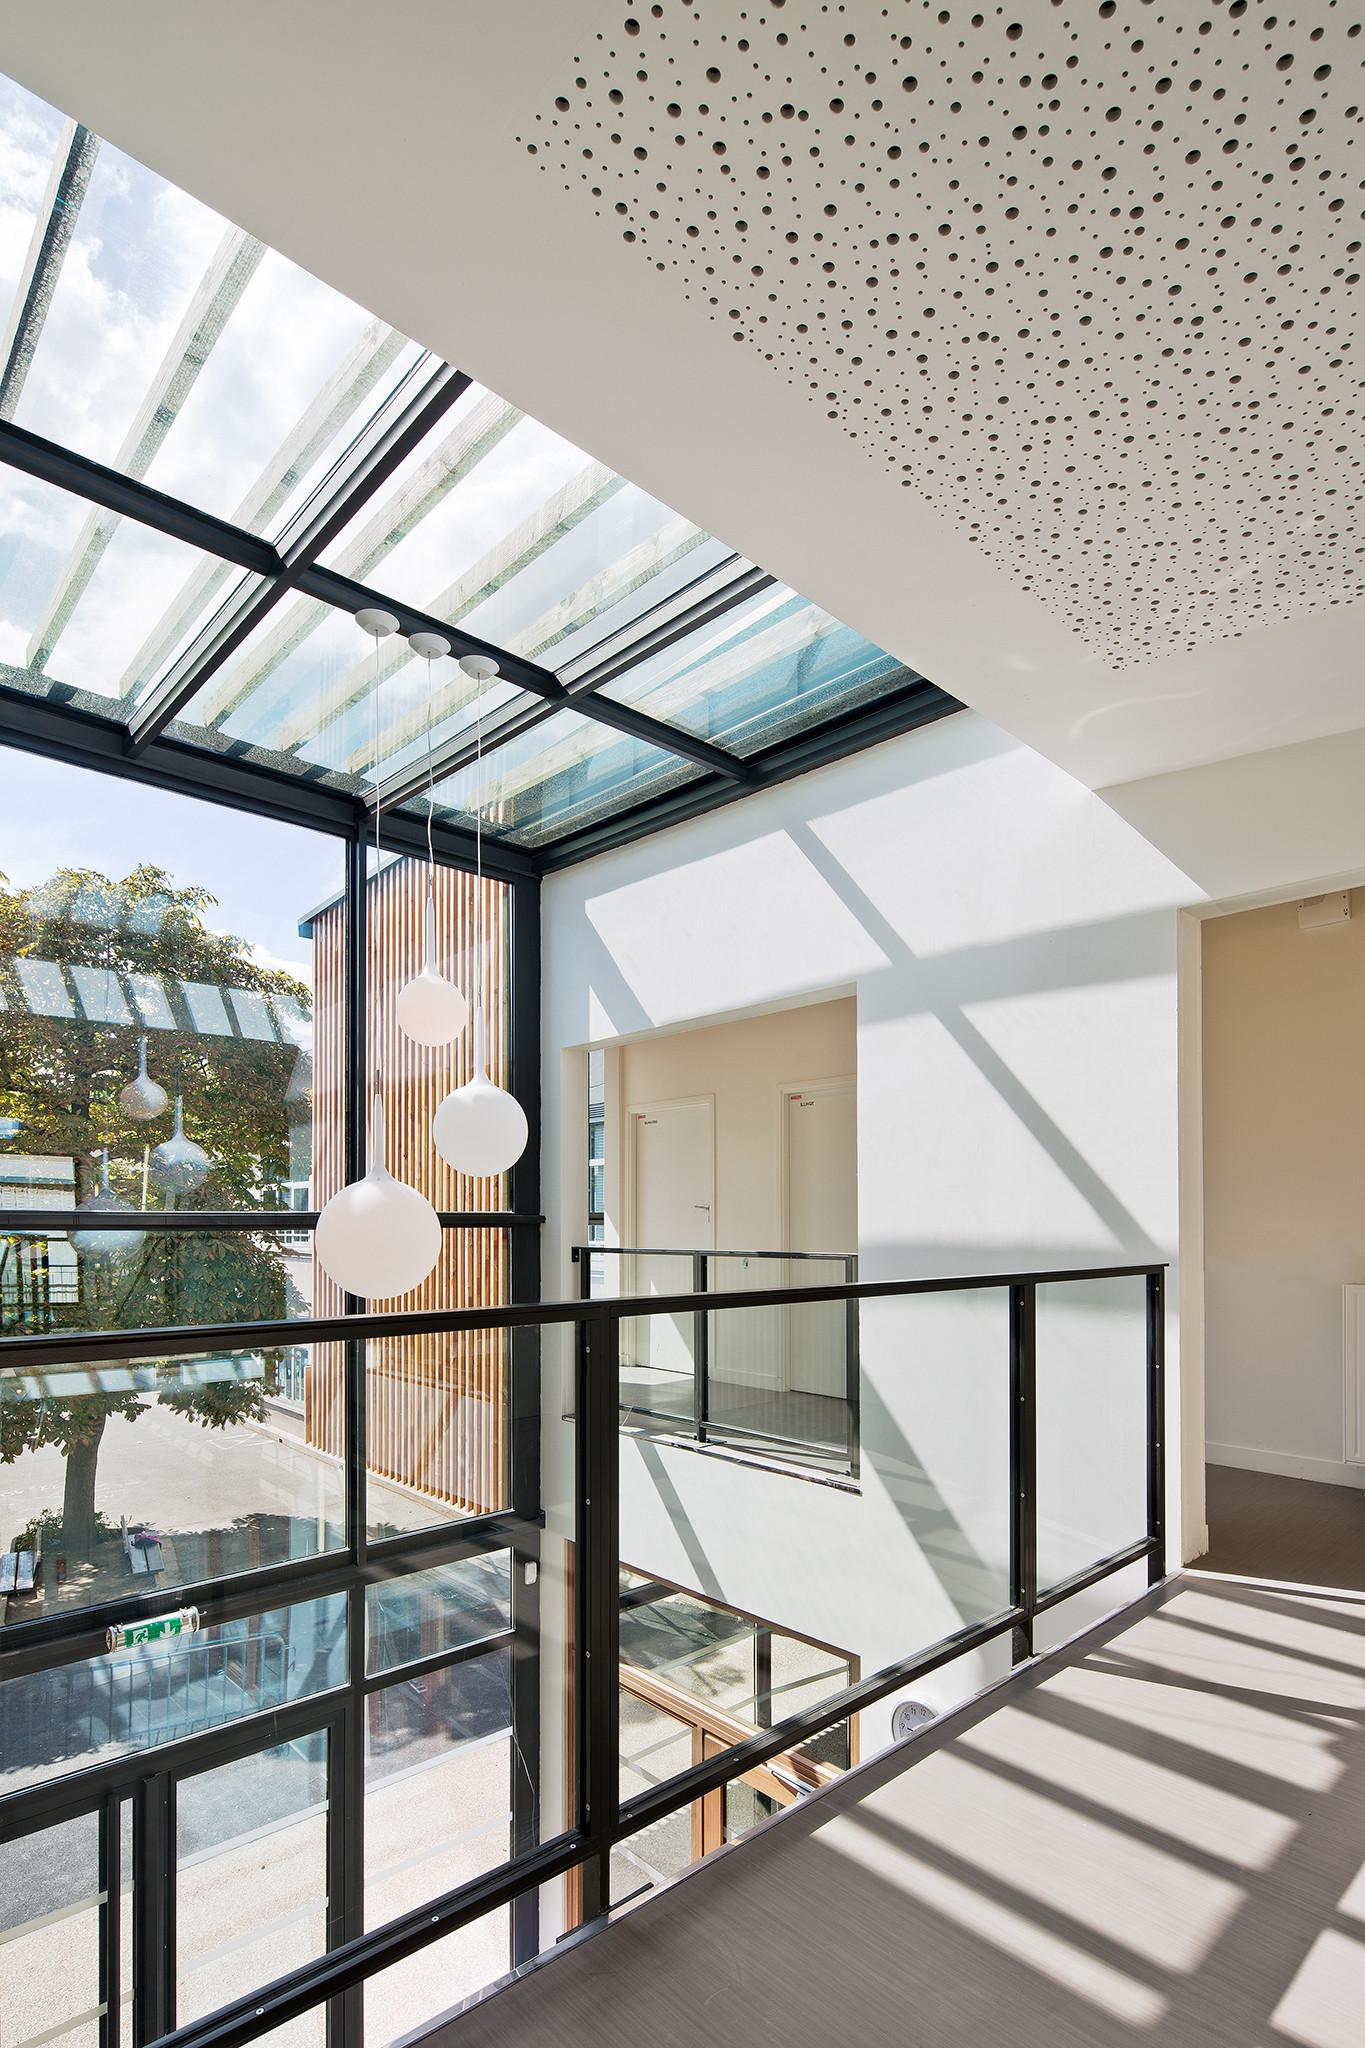 Gallery Of Ablon Sur Seine Reception And Leisure Centre